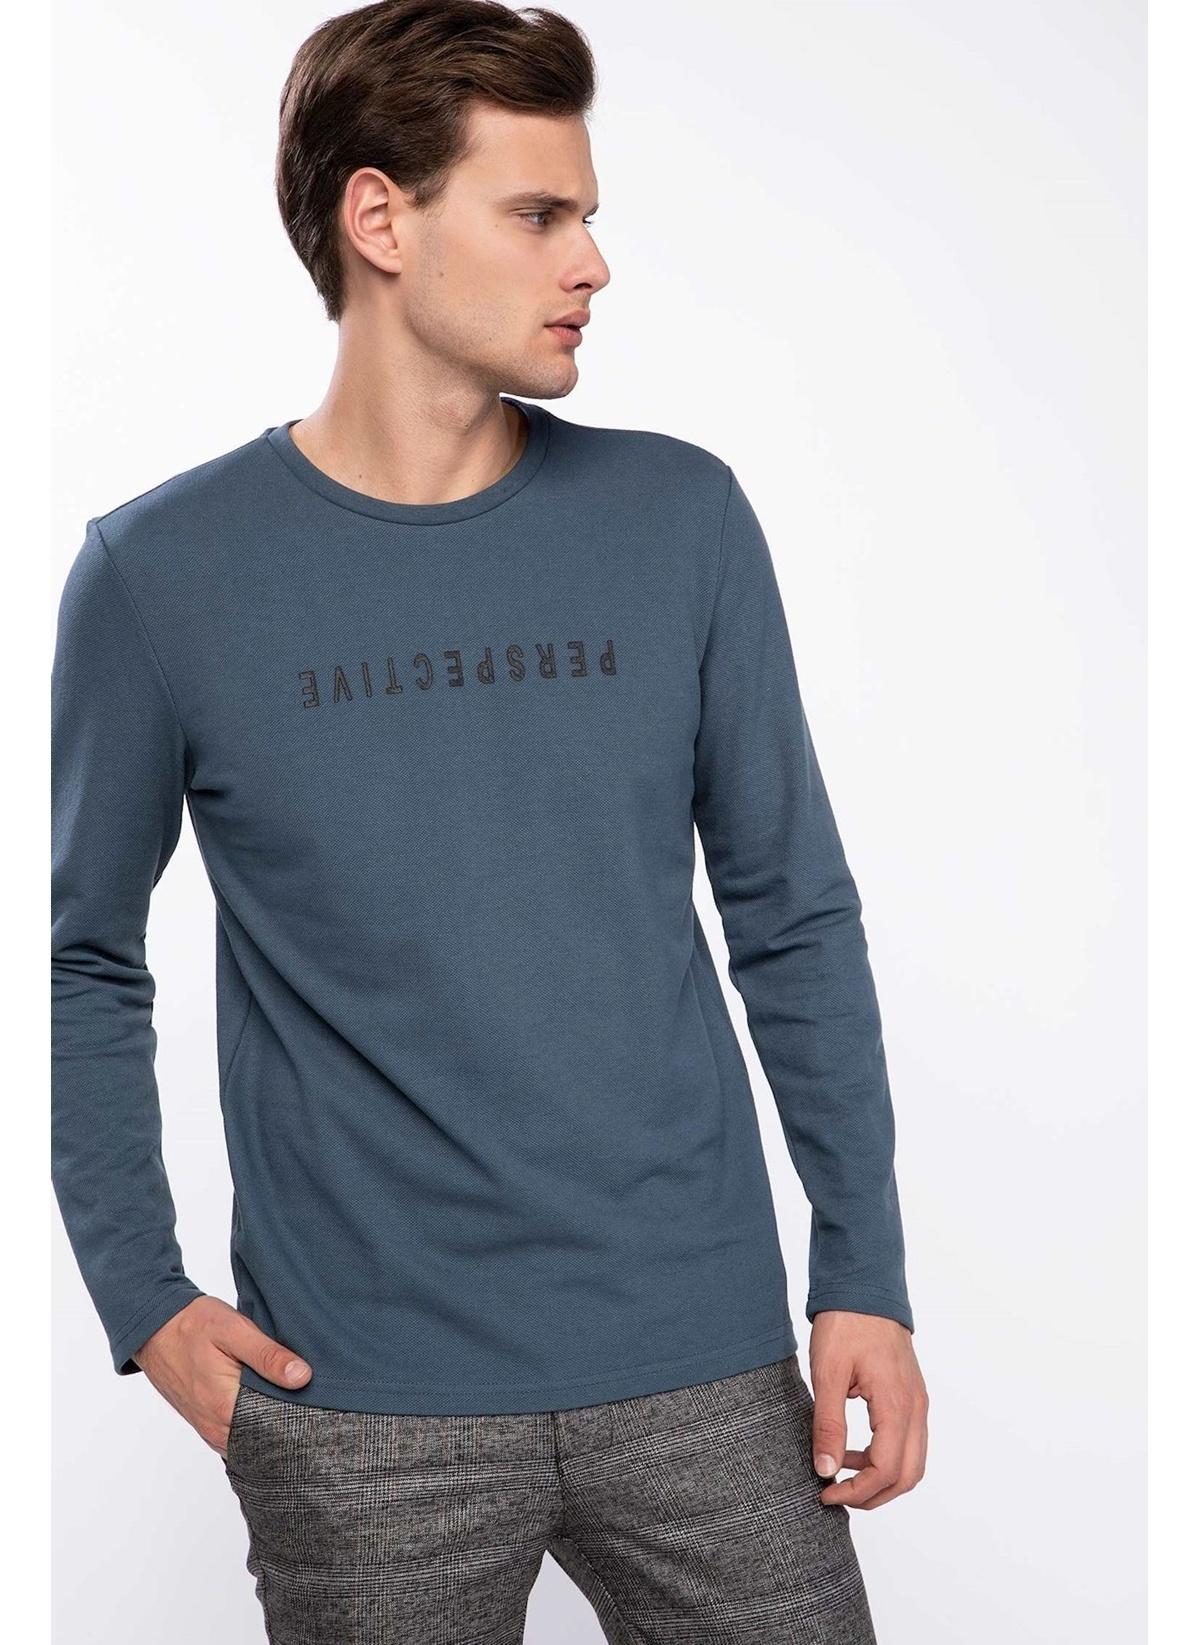 Defacto Yazı Baskılı Slim Fit Sweatshirt K3238az19spın161 Sweatshirt – 29.99 TL